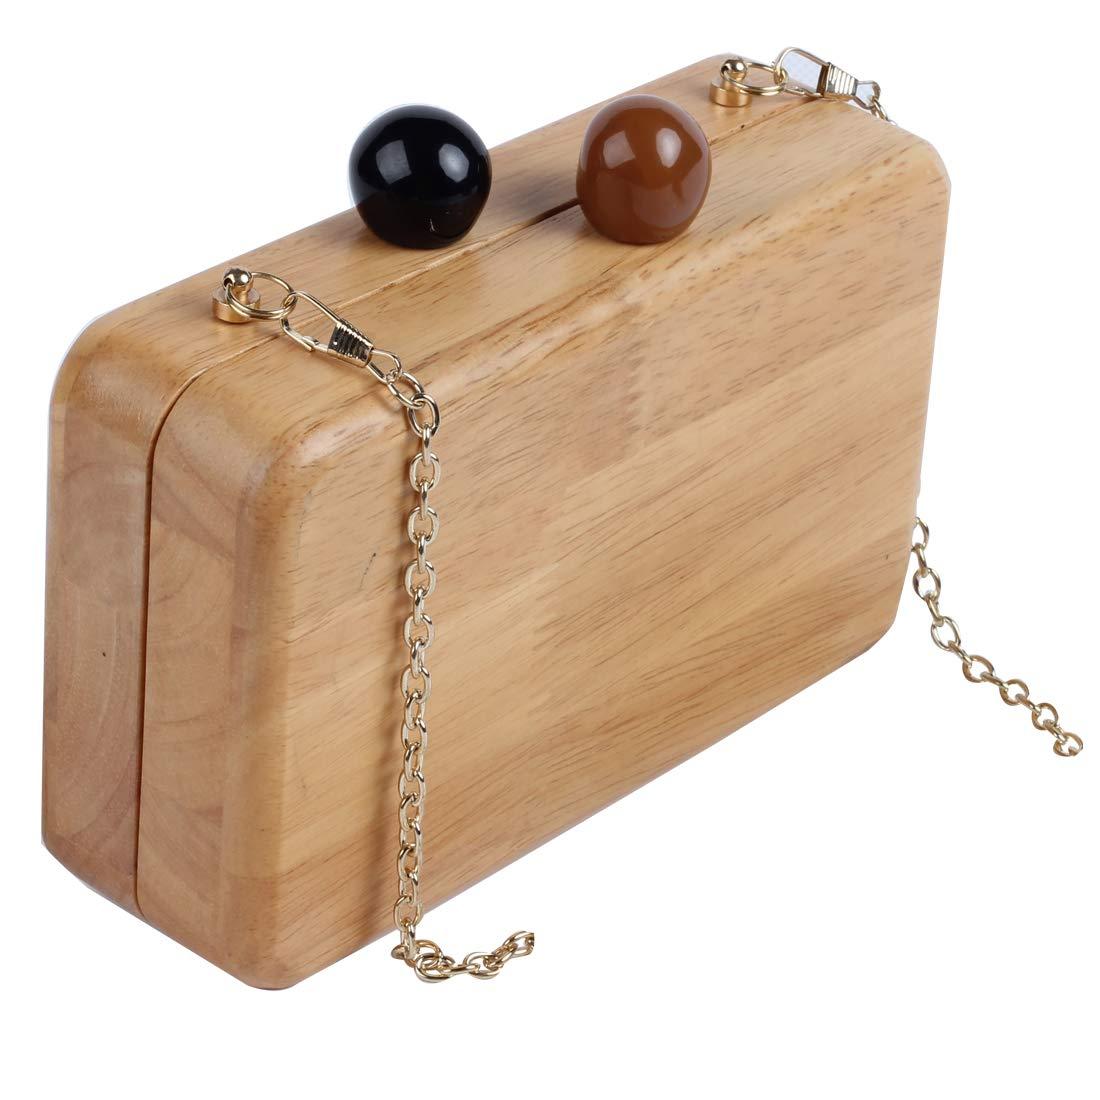 ویکالا · خرید  اصل اورجینال · خرید از آمازون · LETODE Wooden Evening Bag Wood Clutch Purse for Women Handbag shoulder Bag with Metal Chain (WOOD) wekala · ویکالا